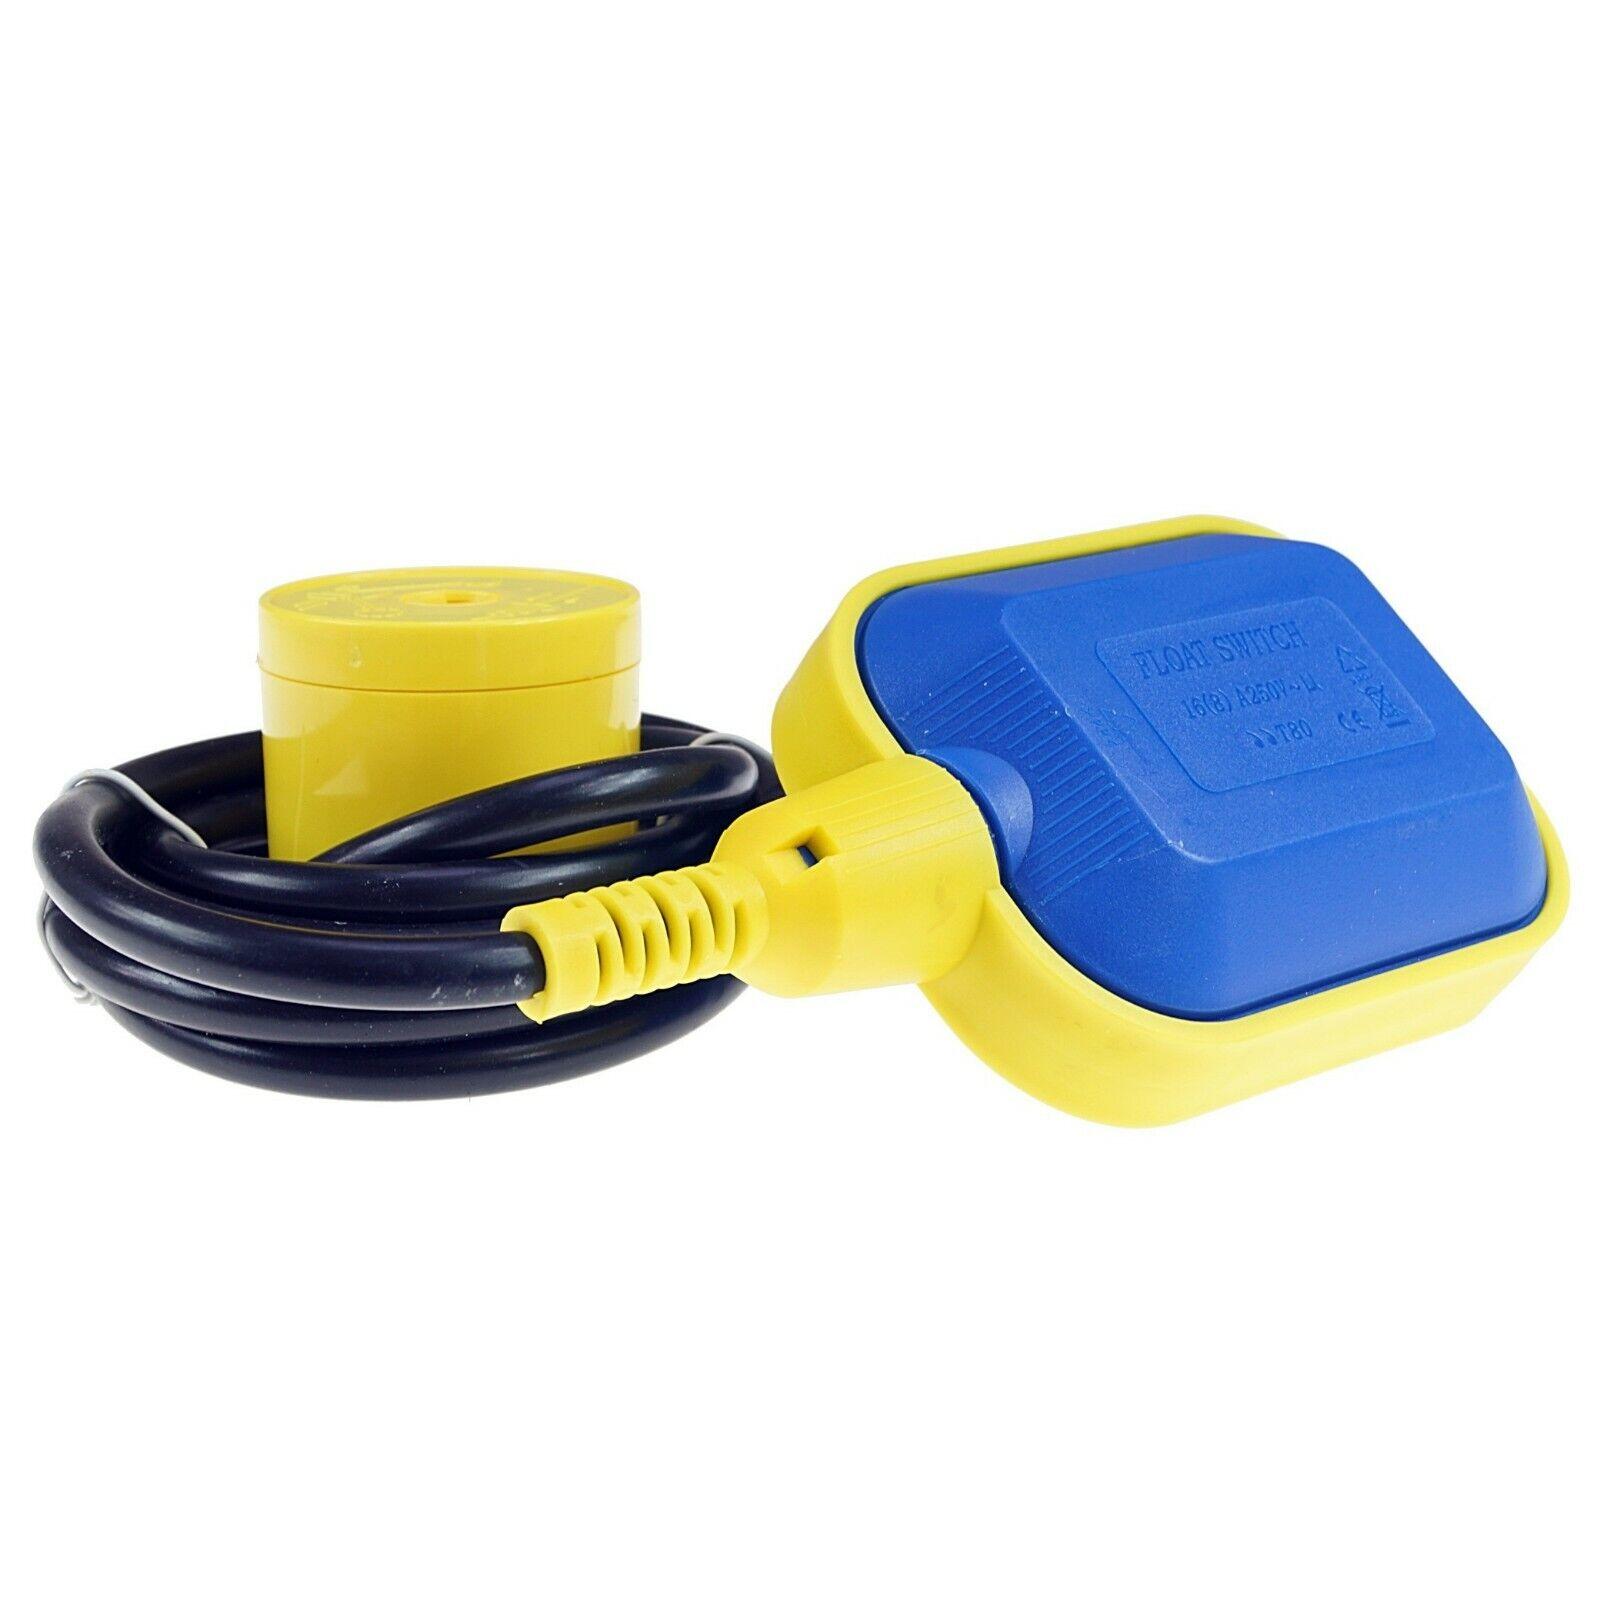 Schwimmerschalter 10m Kabel 250V Schwimmschalter Pumpe zum Befüllen Entleeren DE